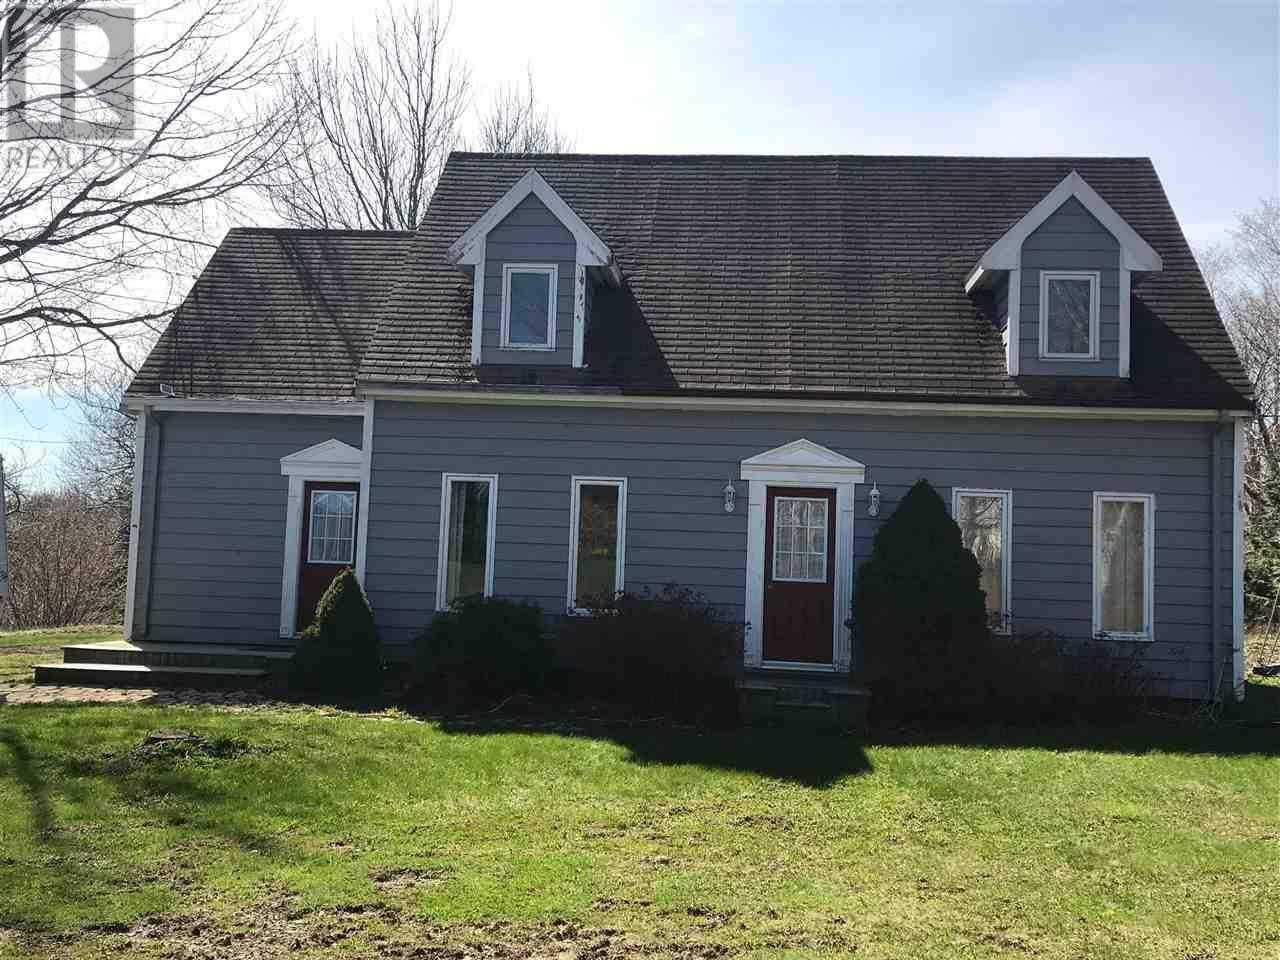 House for sale at 2920 Ridge Rd Acaciaville Nova Scotia - MLS: 201909778